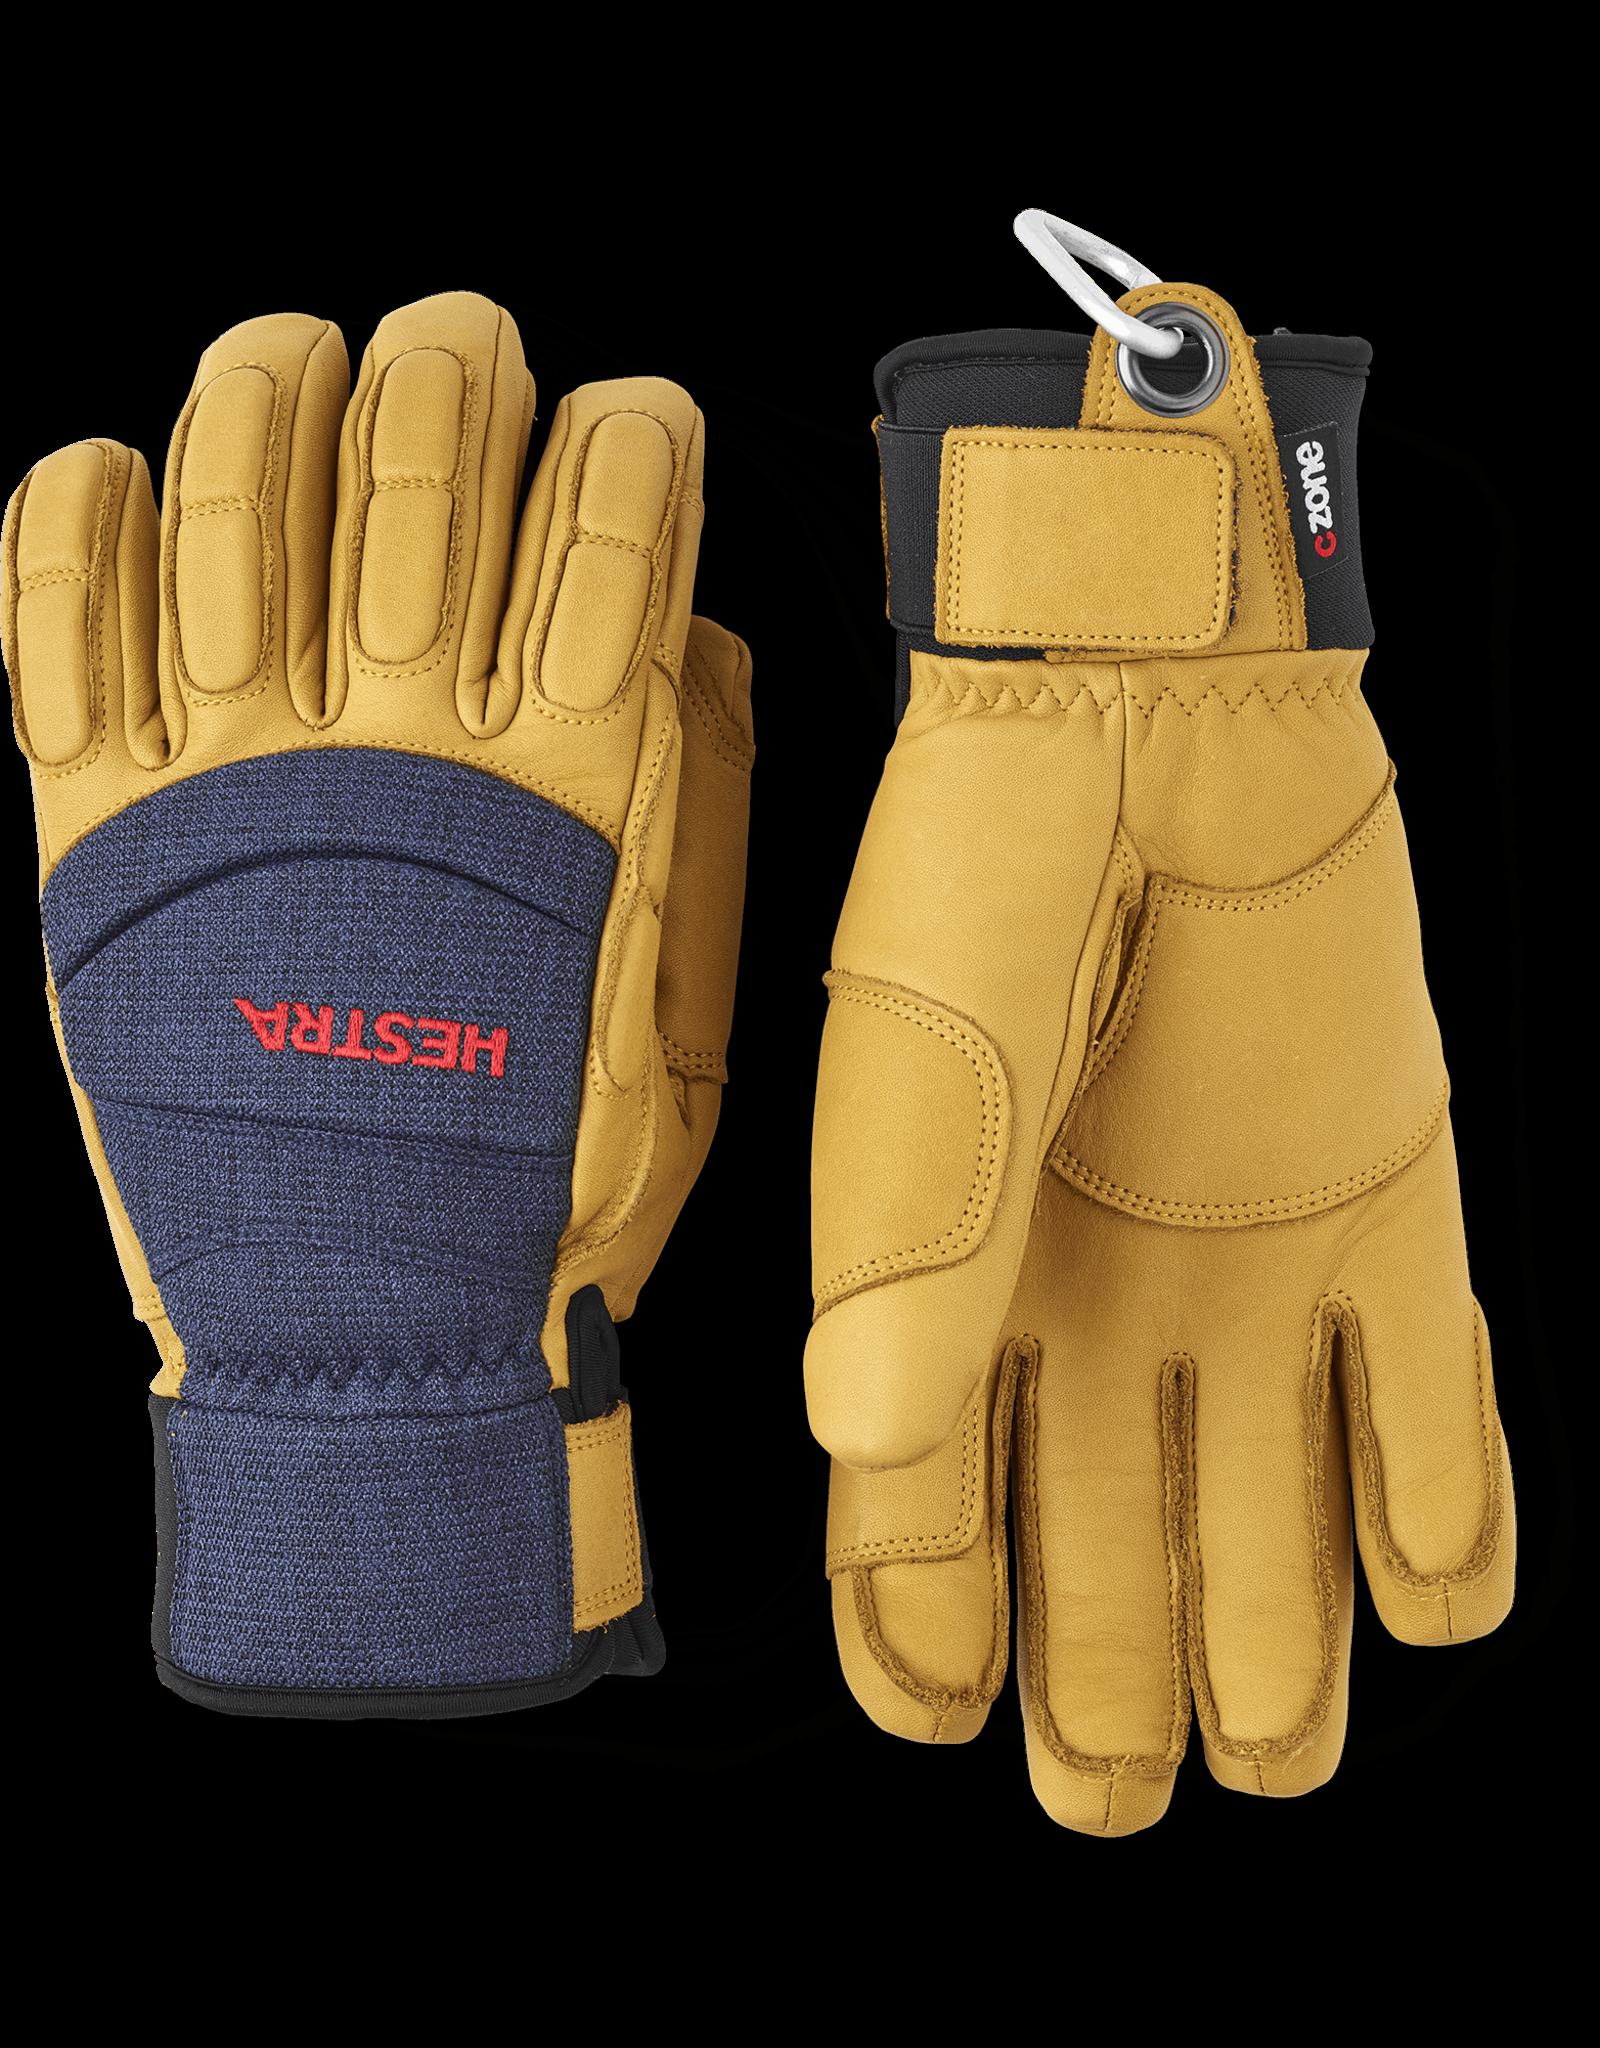 HESTRA Vertical Cut CZone Glove Navy/Tan